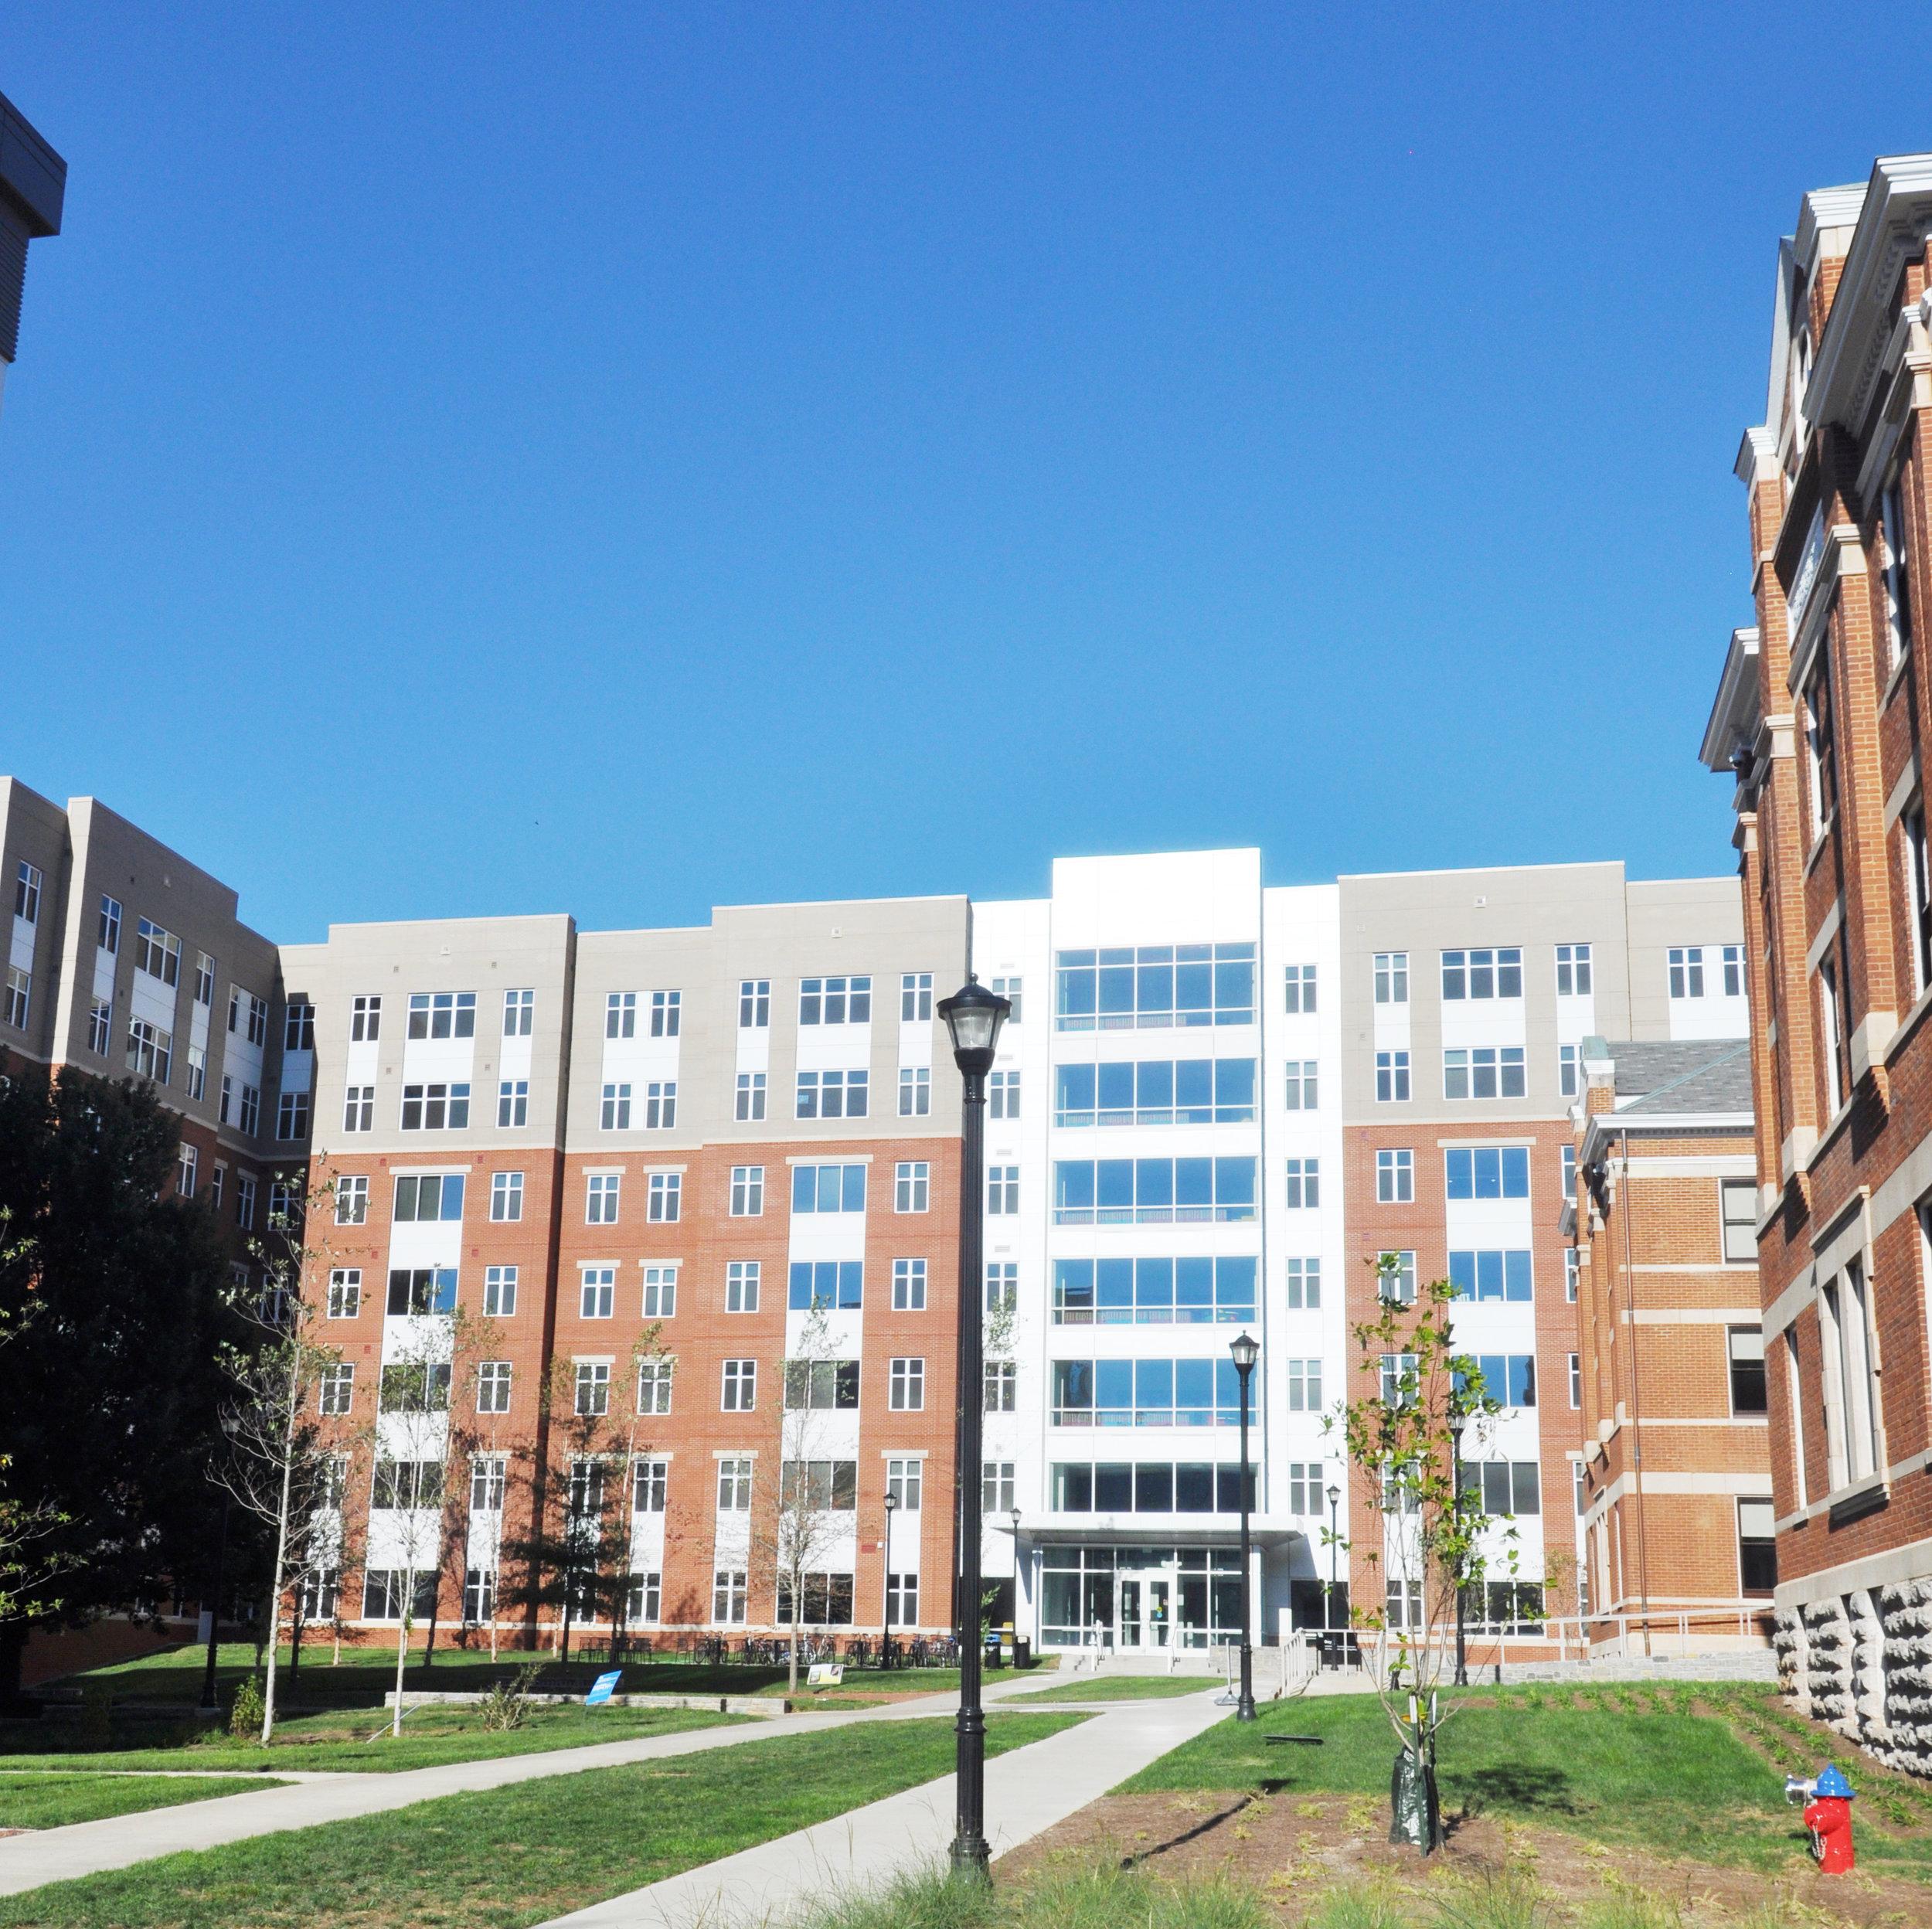 University of Kentucky - Limestone Park II (Boyd)